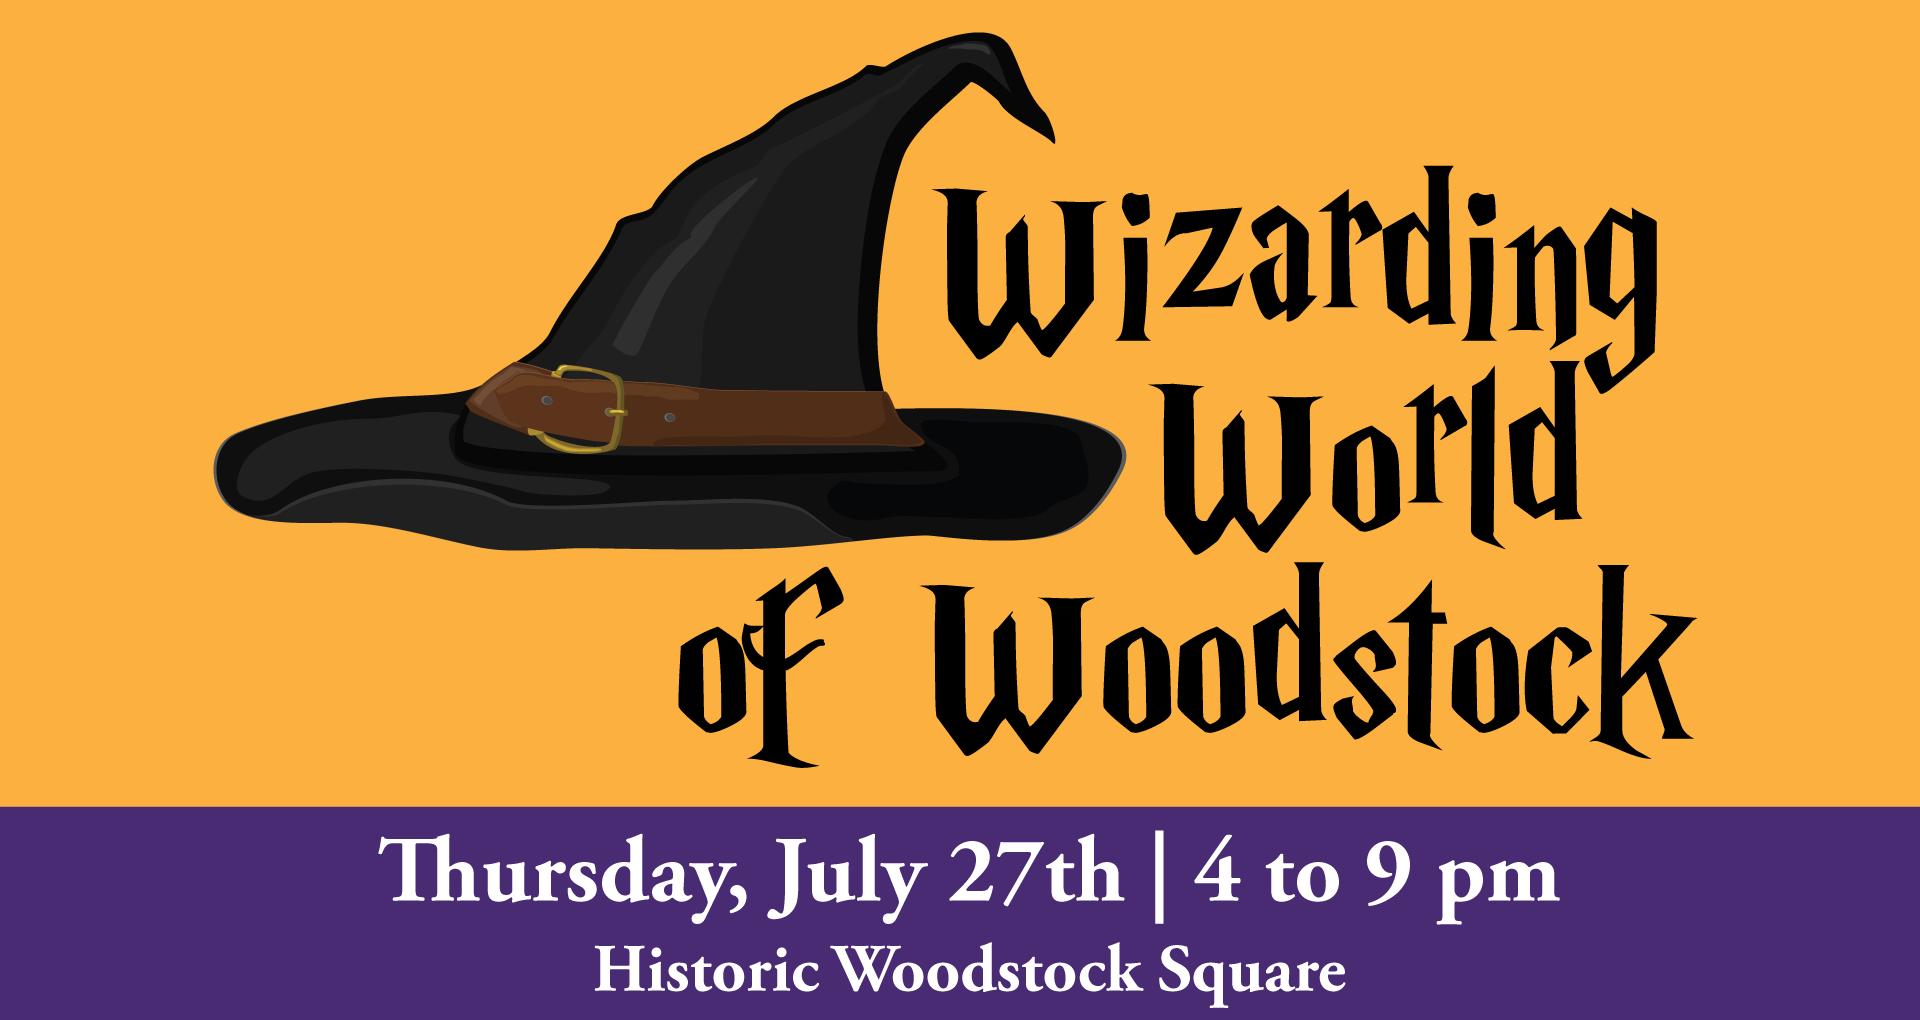 Wizarding World of Woodstock